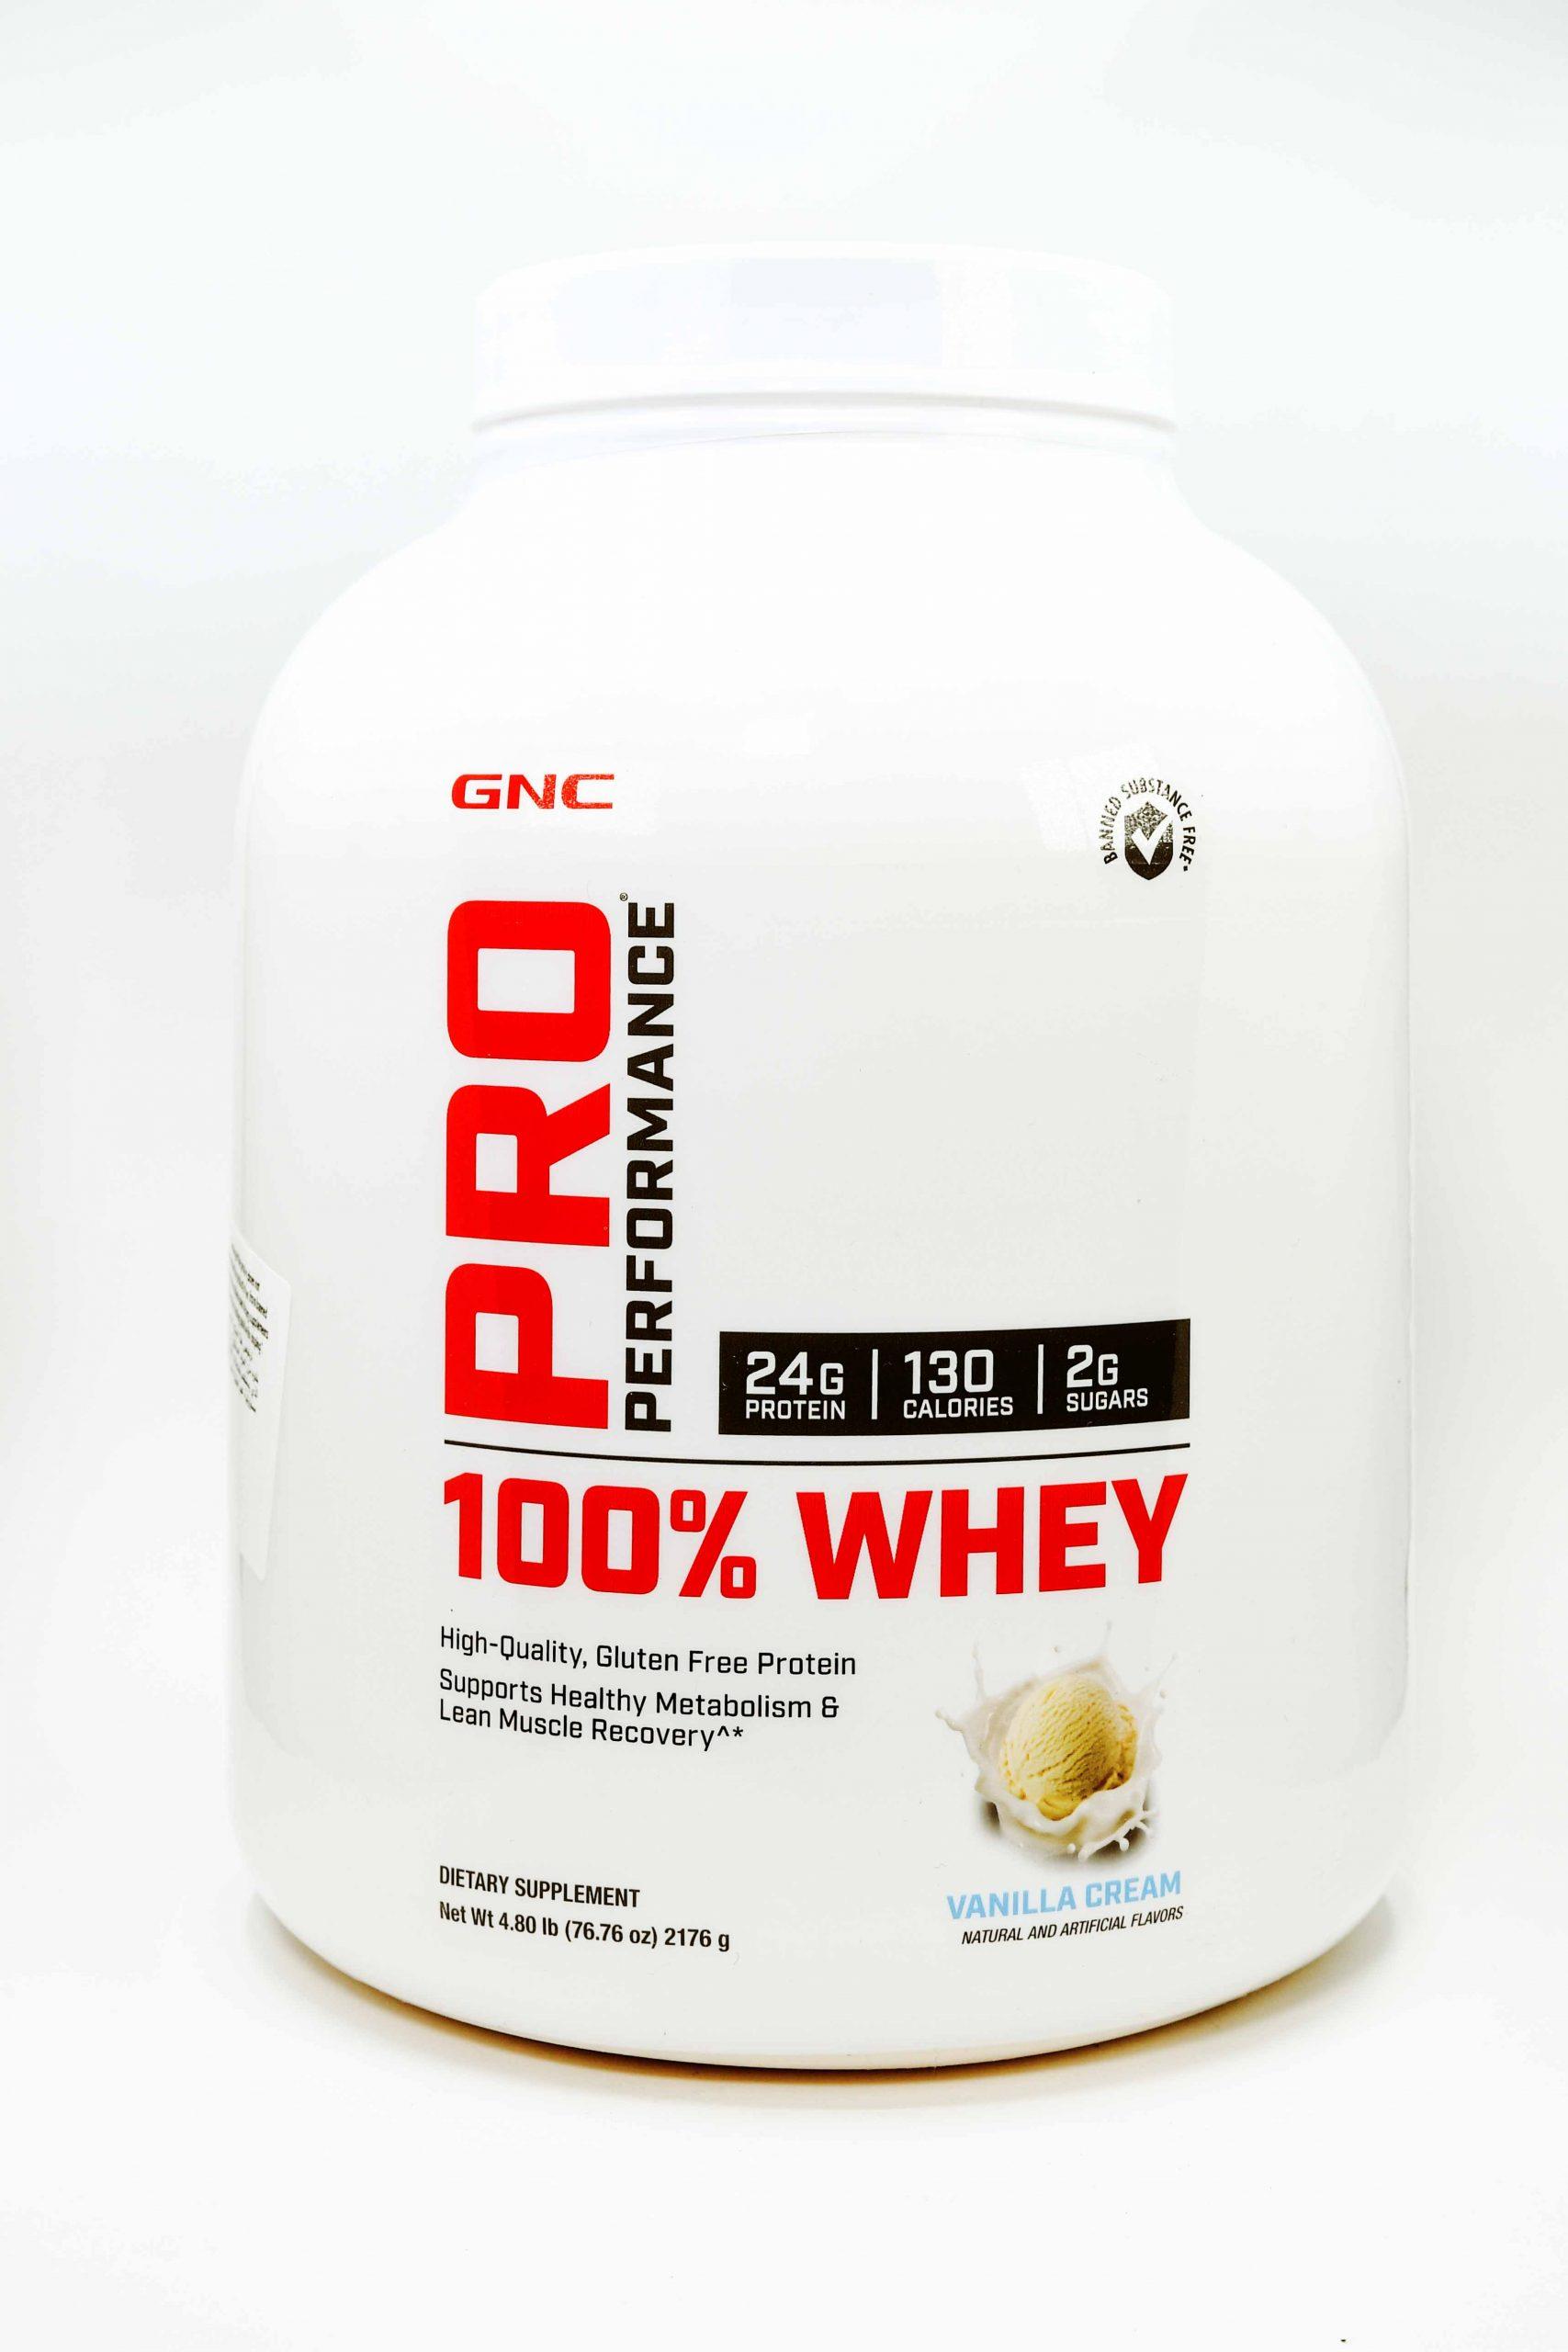 GNC PRO PERFORMANCE WHEY Protein Vanilla Cream